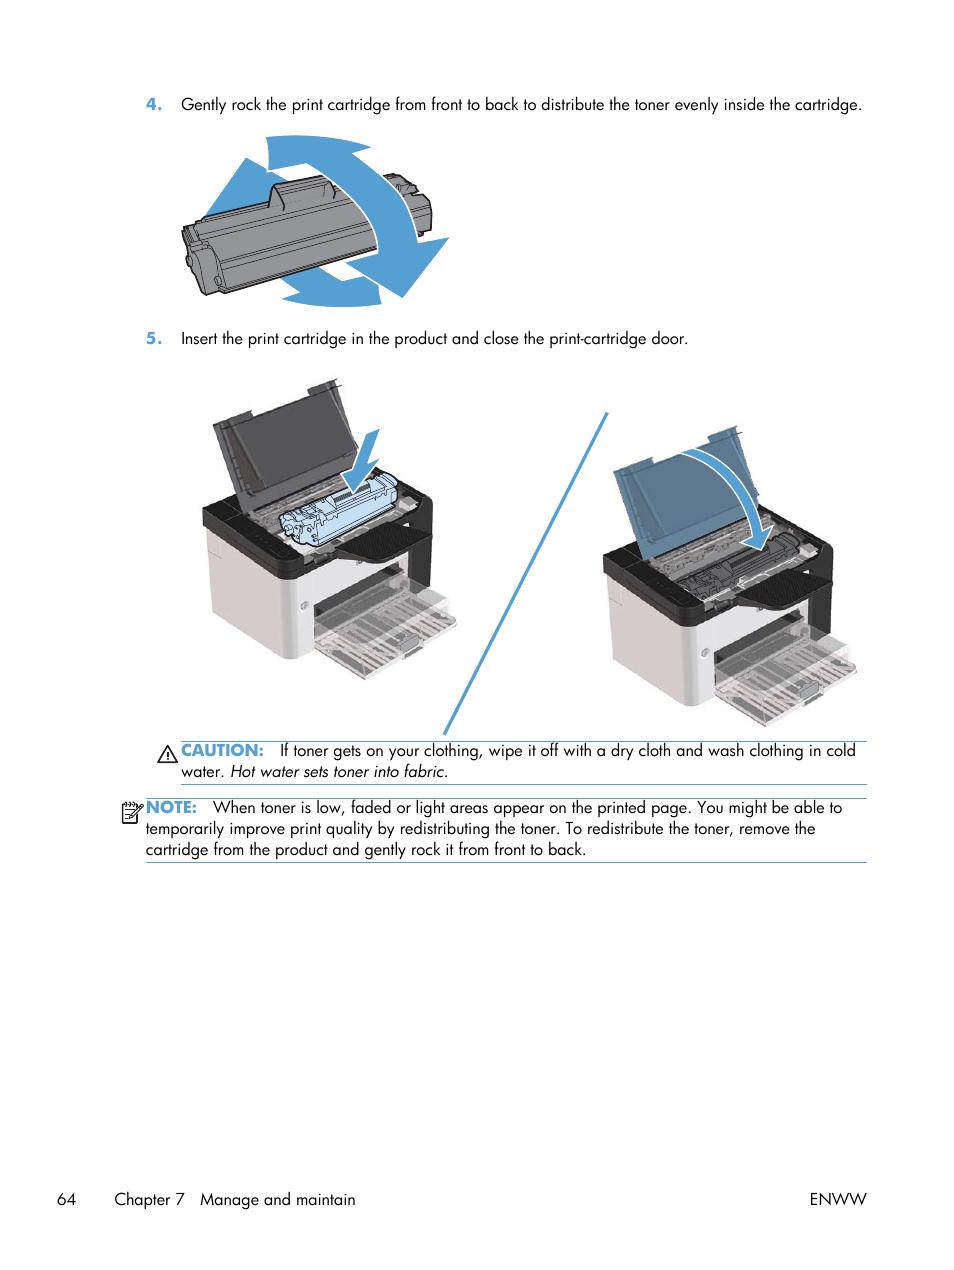 hp laserjet p1606dn user manual page 76 152 original mode rh manualsdir com hp laserjet pro p1606dn service manual hp laserjet pro p1606dn instruction manual